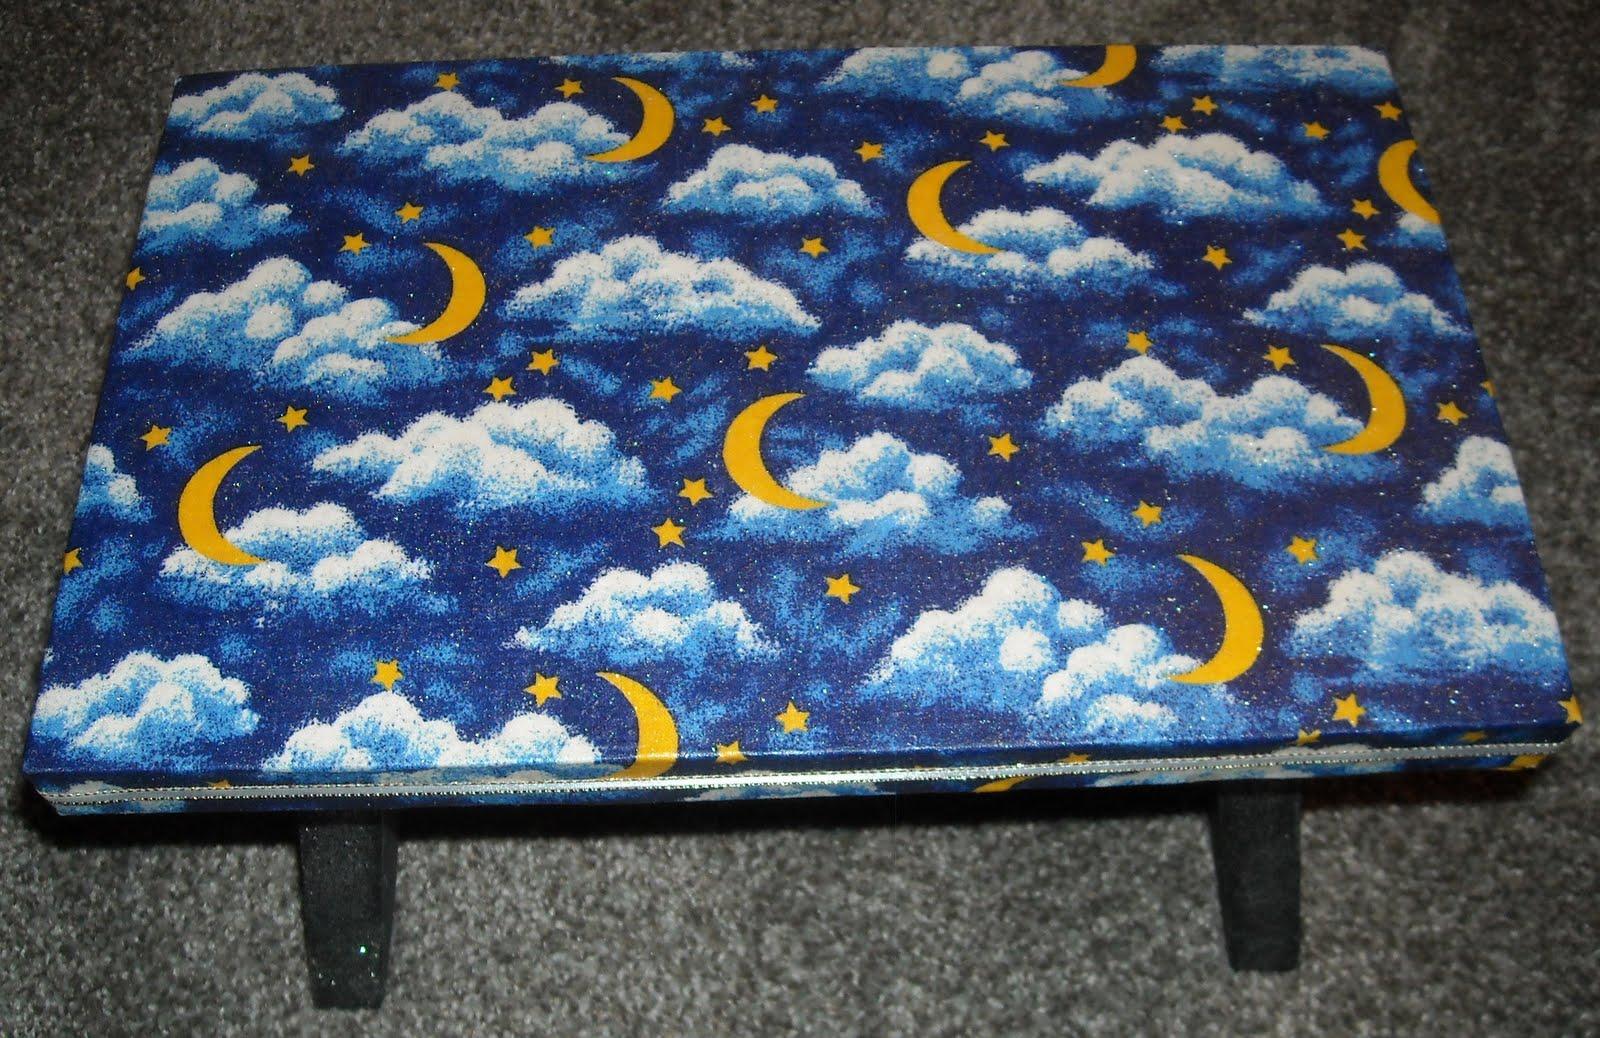 Miraculous Babycakes Crafts Decoupage Foot Stool Machost Co Dining Chair Design Ideas Machostcouk